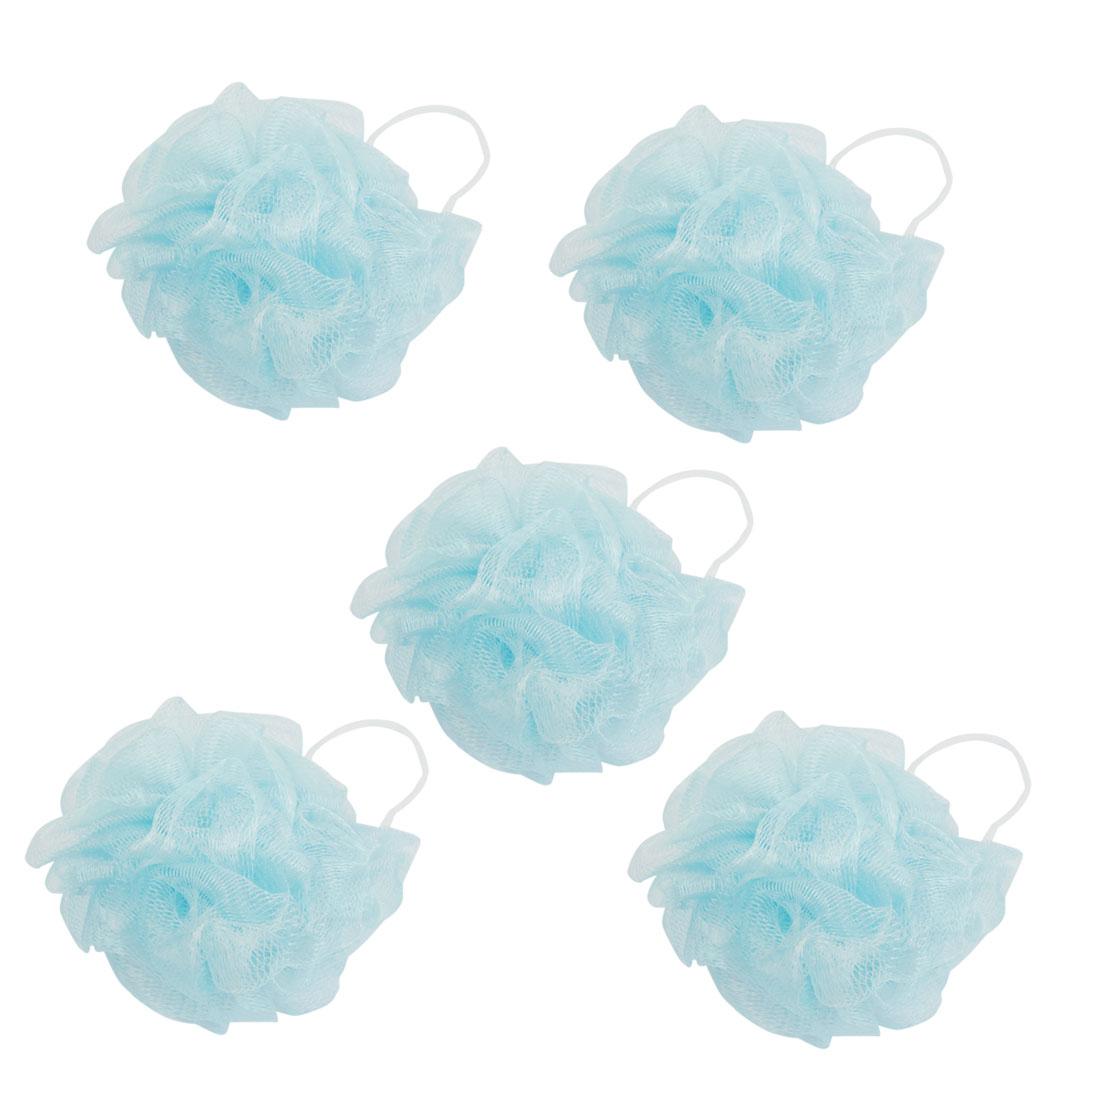 Bathroom Body Shower Ball Shaped Blue Nylon Mesh Nets Pouf 5 Pcs